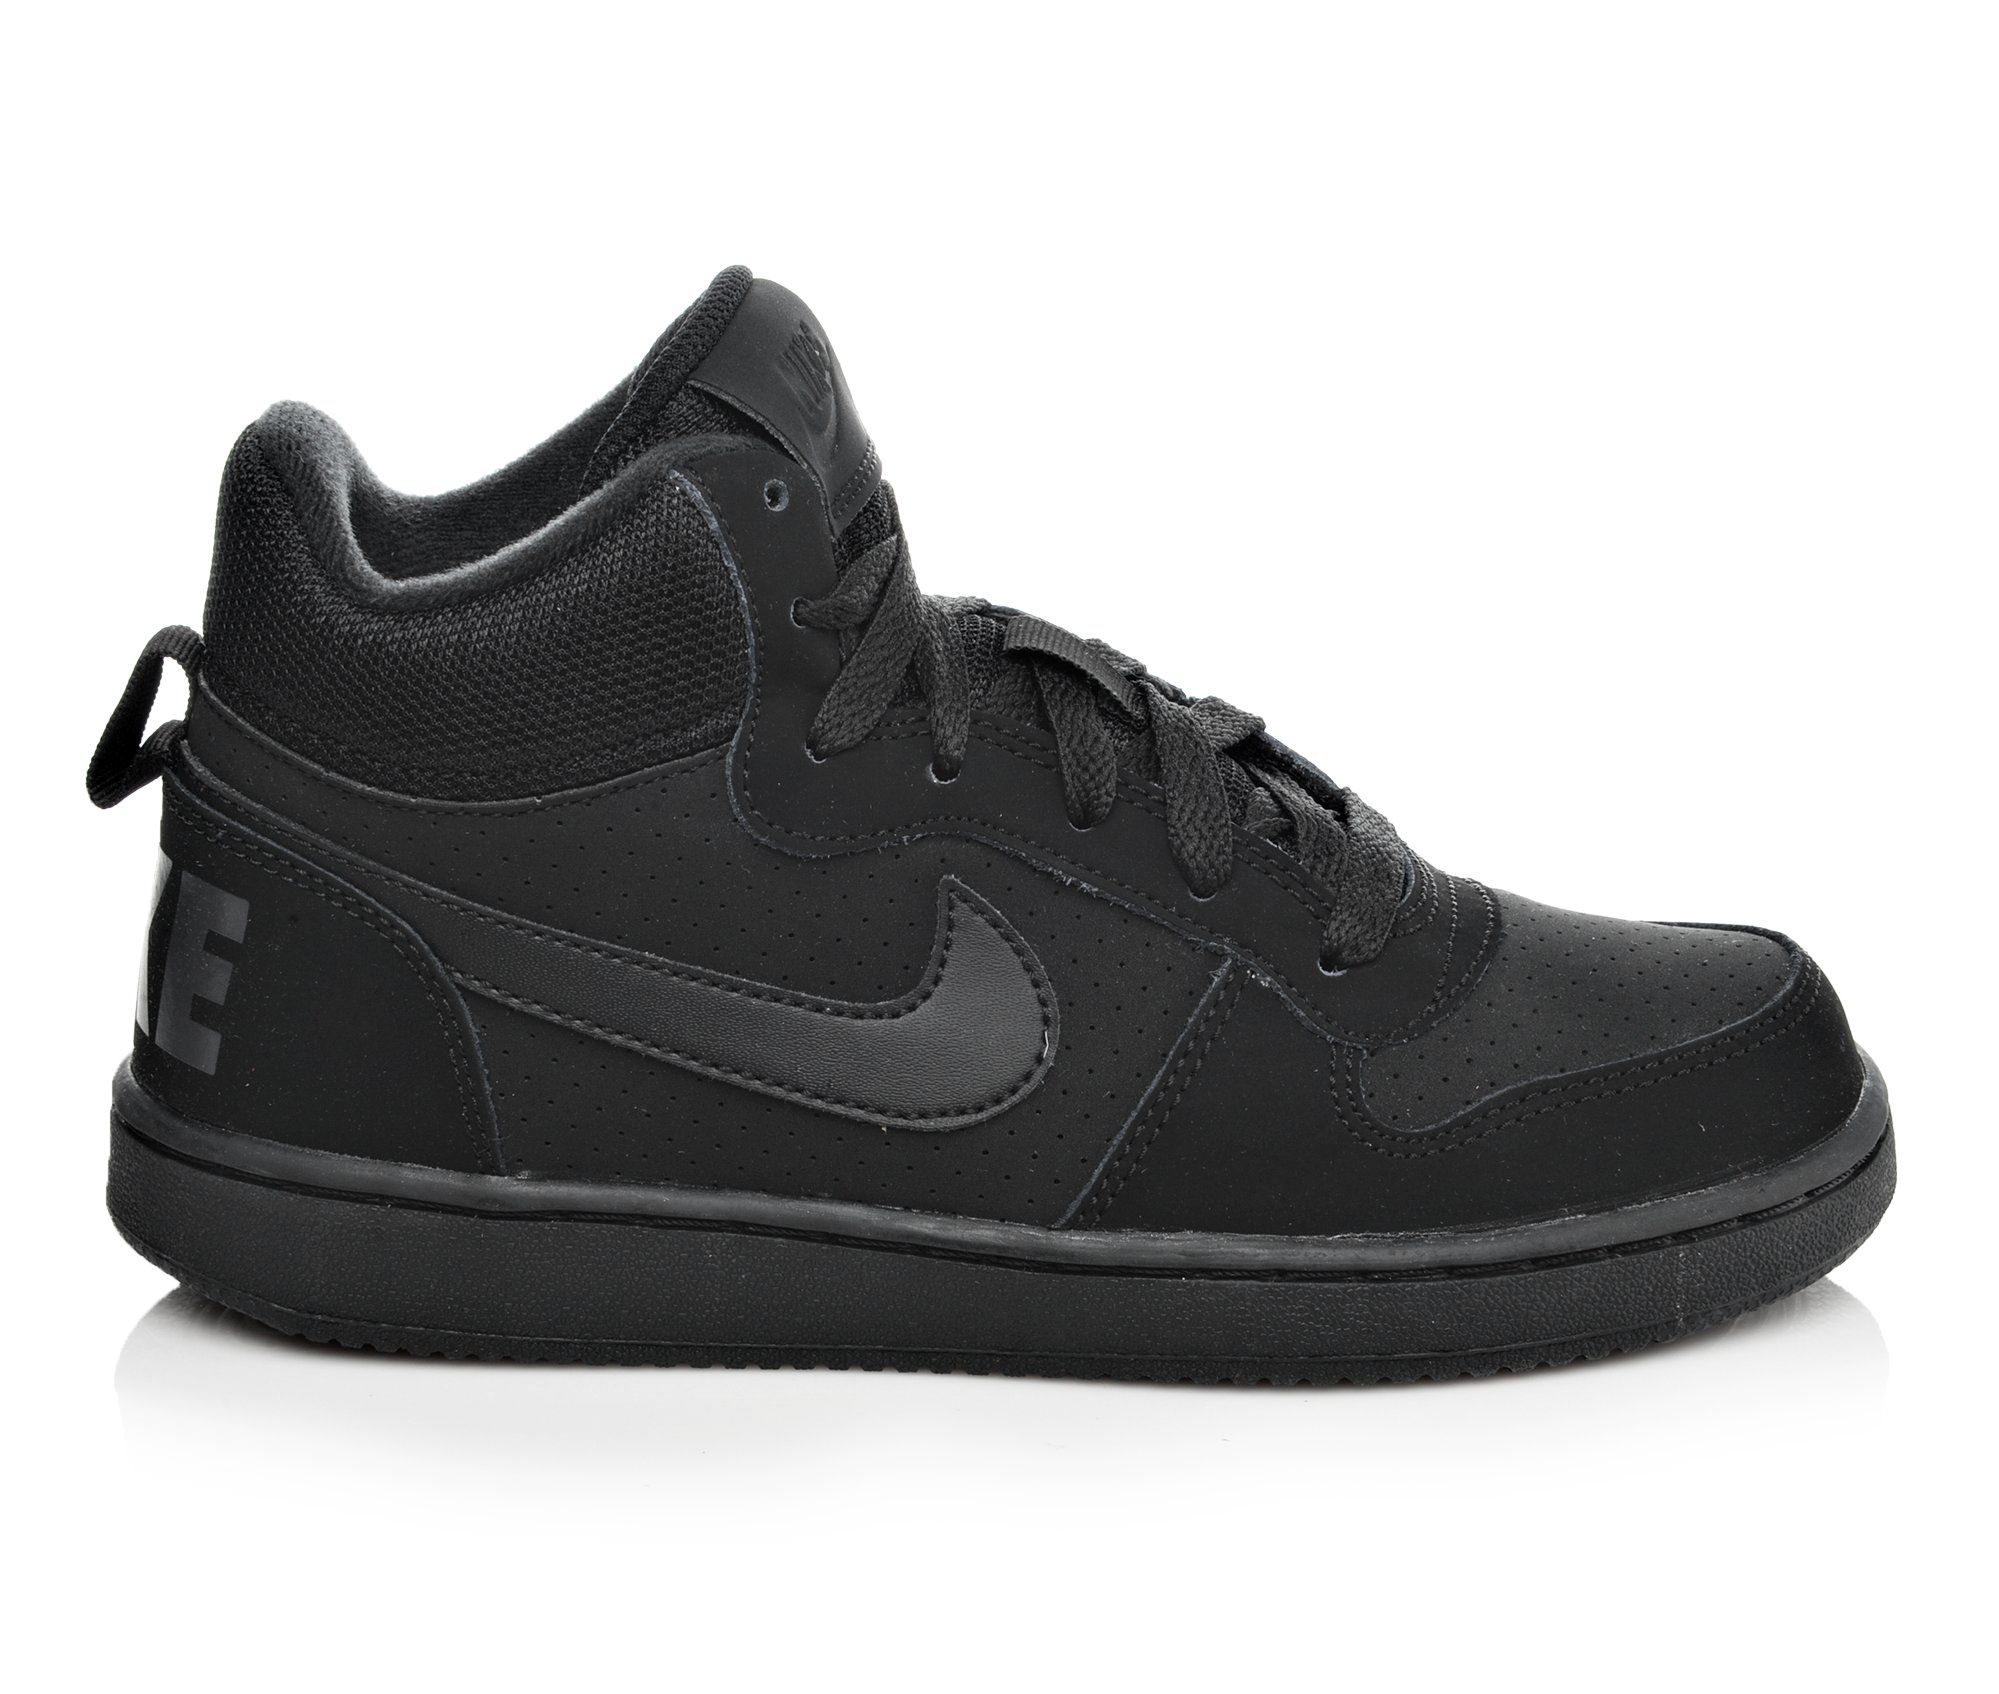 Boys' Nike Court Borough Mid Sneakers (Black)